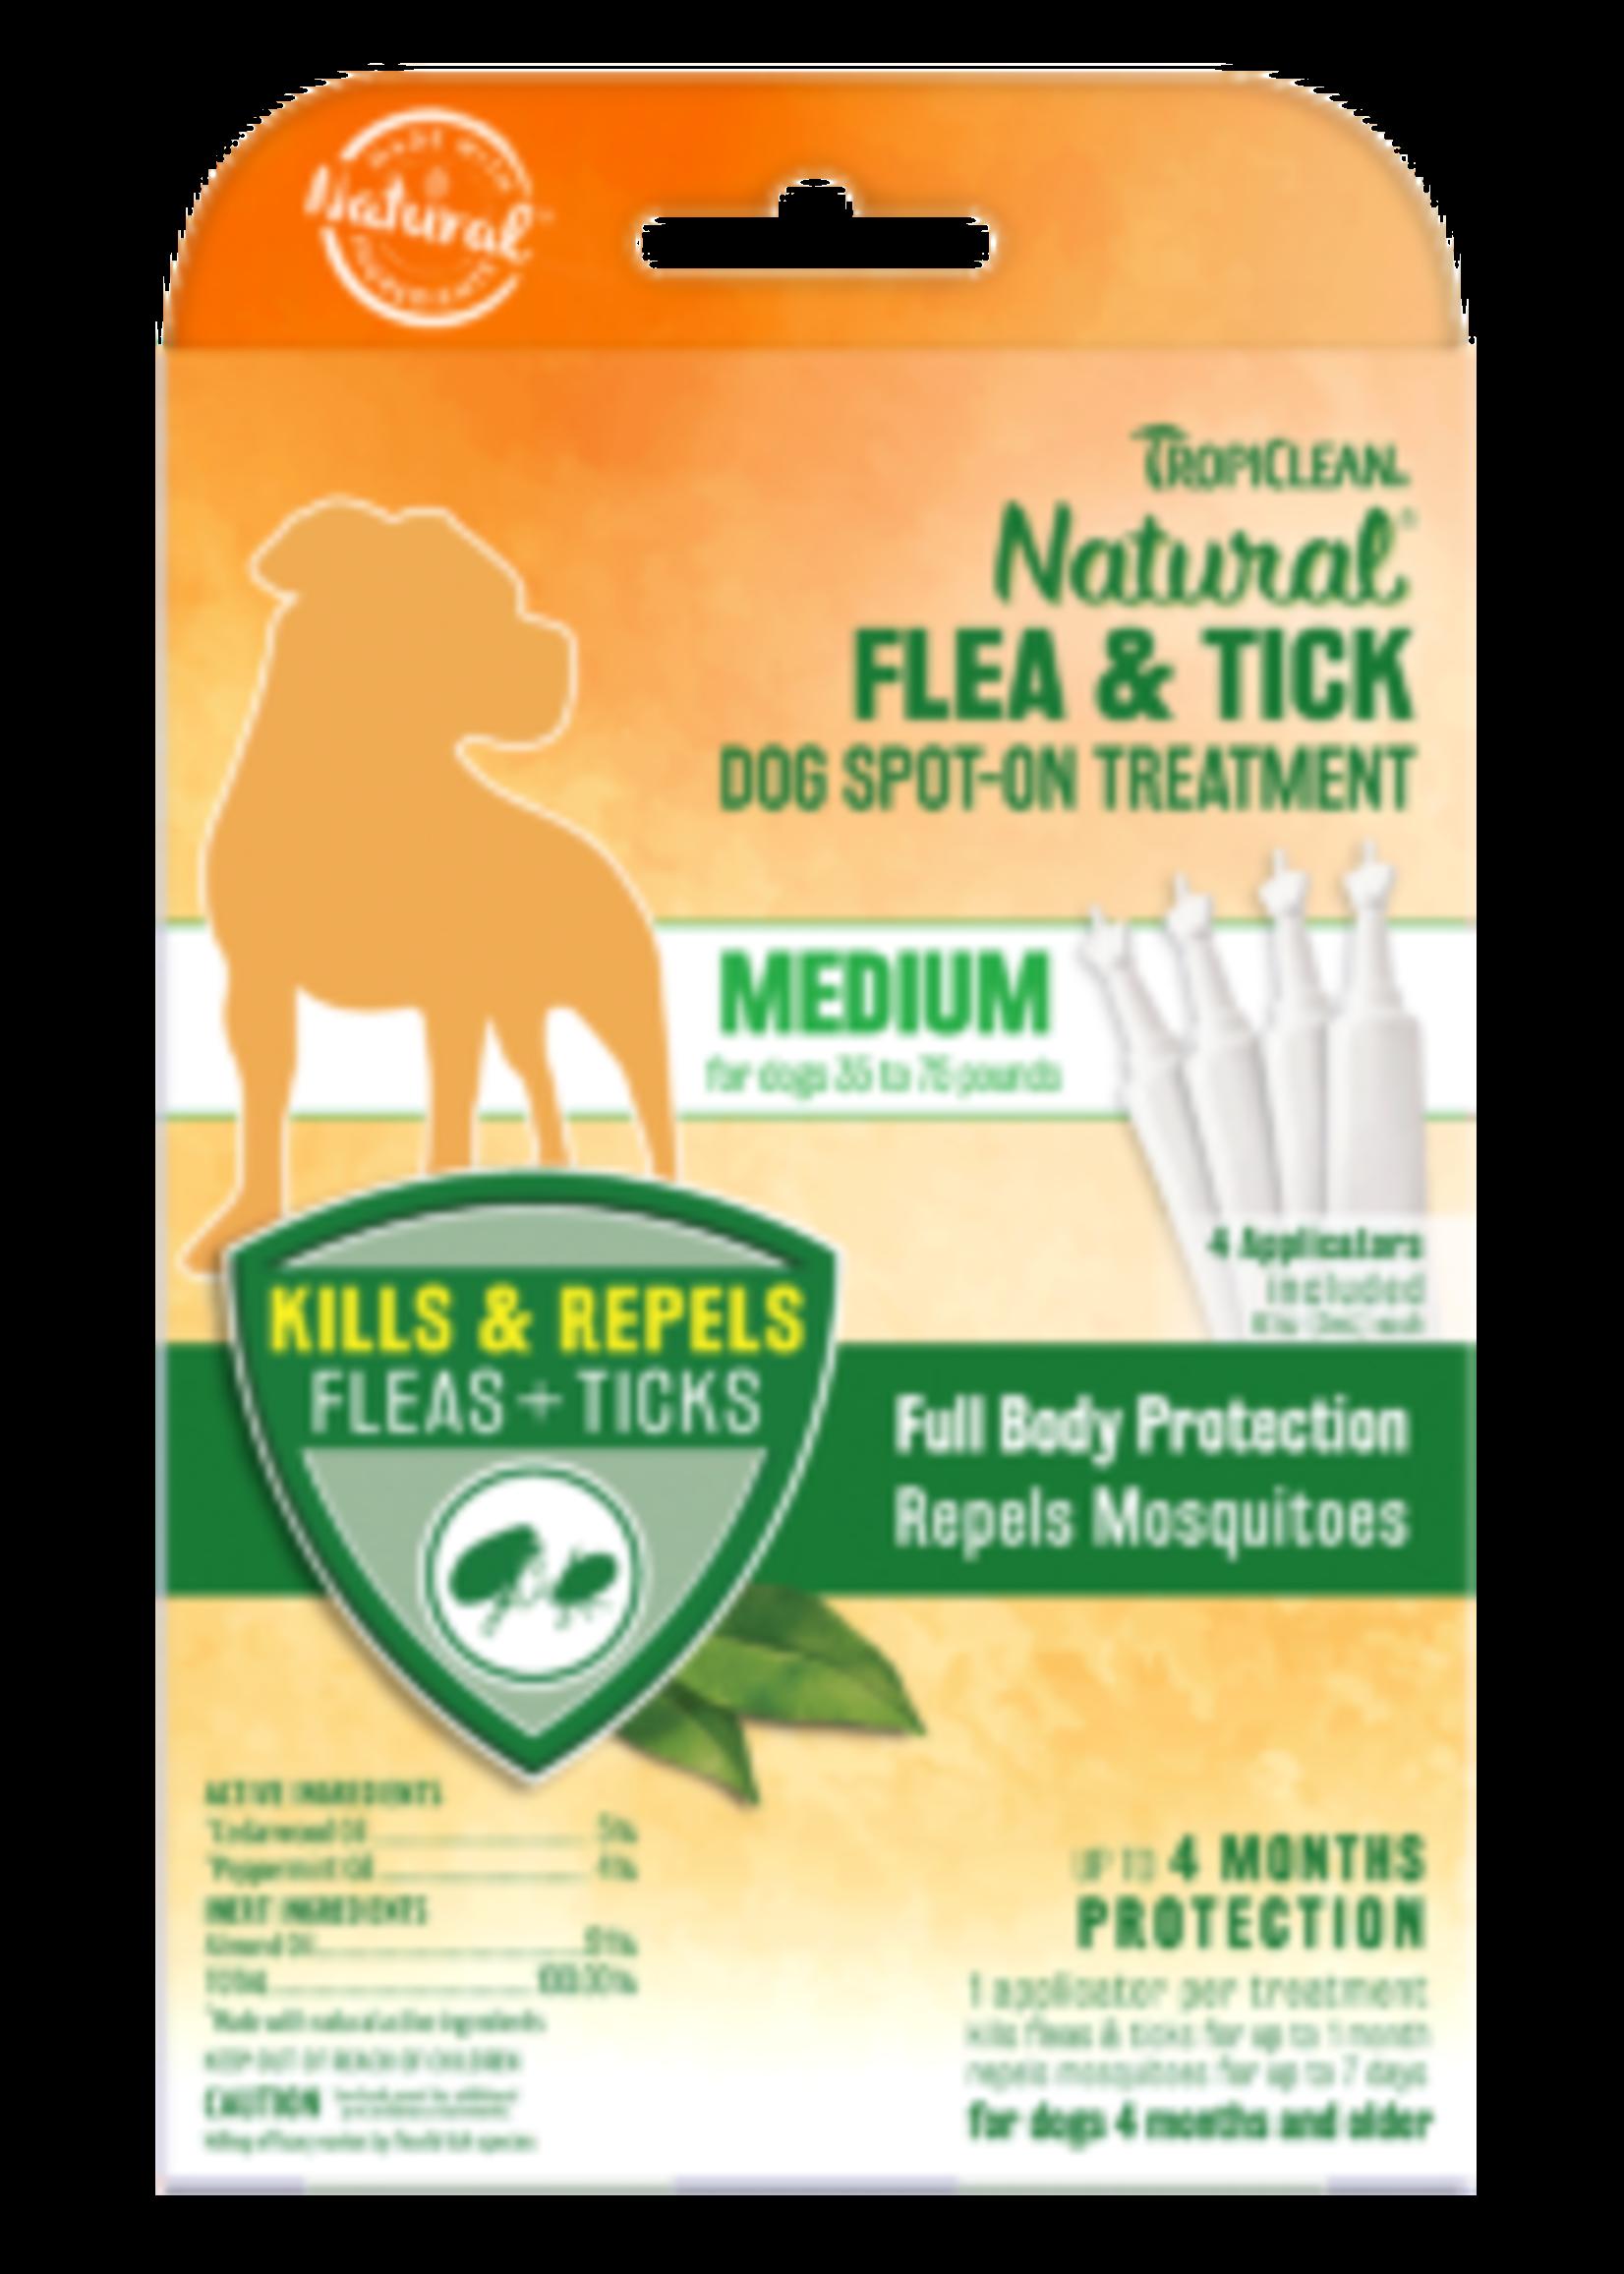 TropiClean TropiClean Dog Flea & Tick Spot-on Treatment